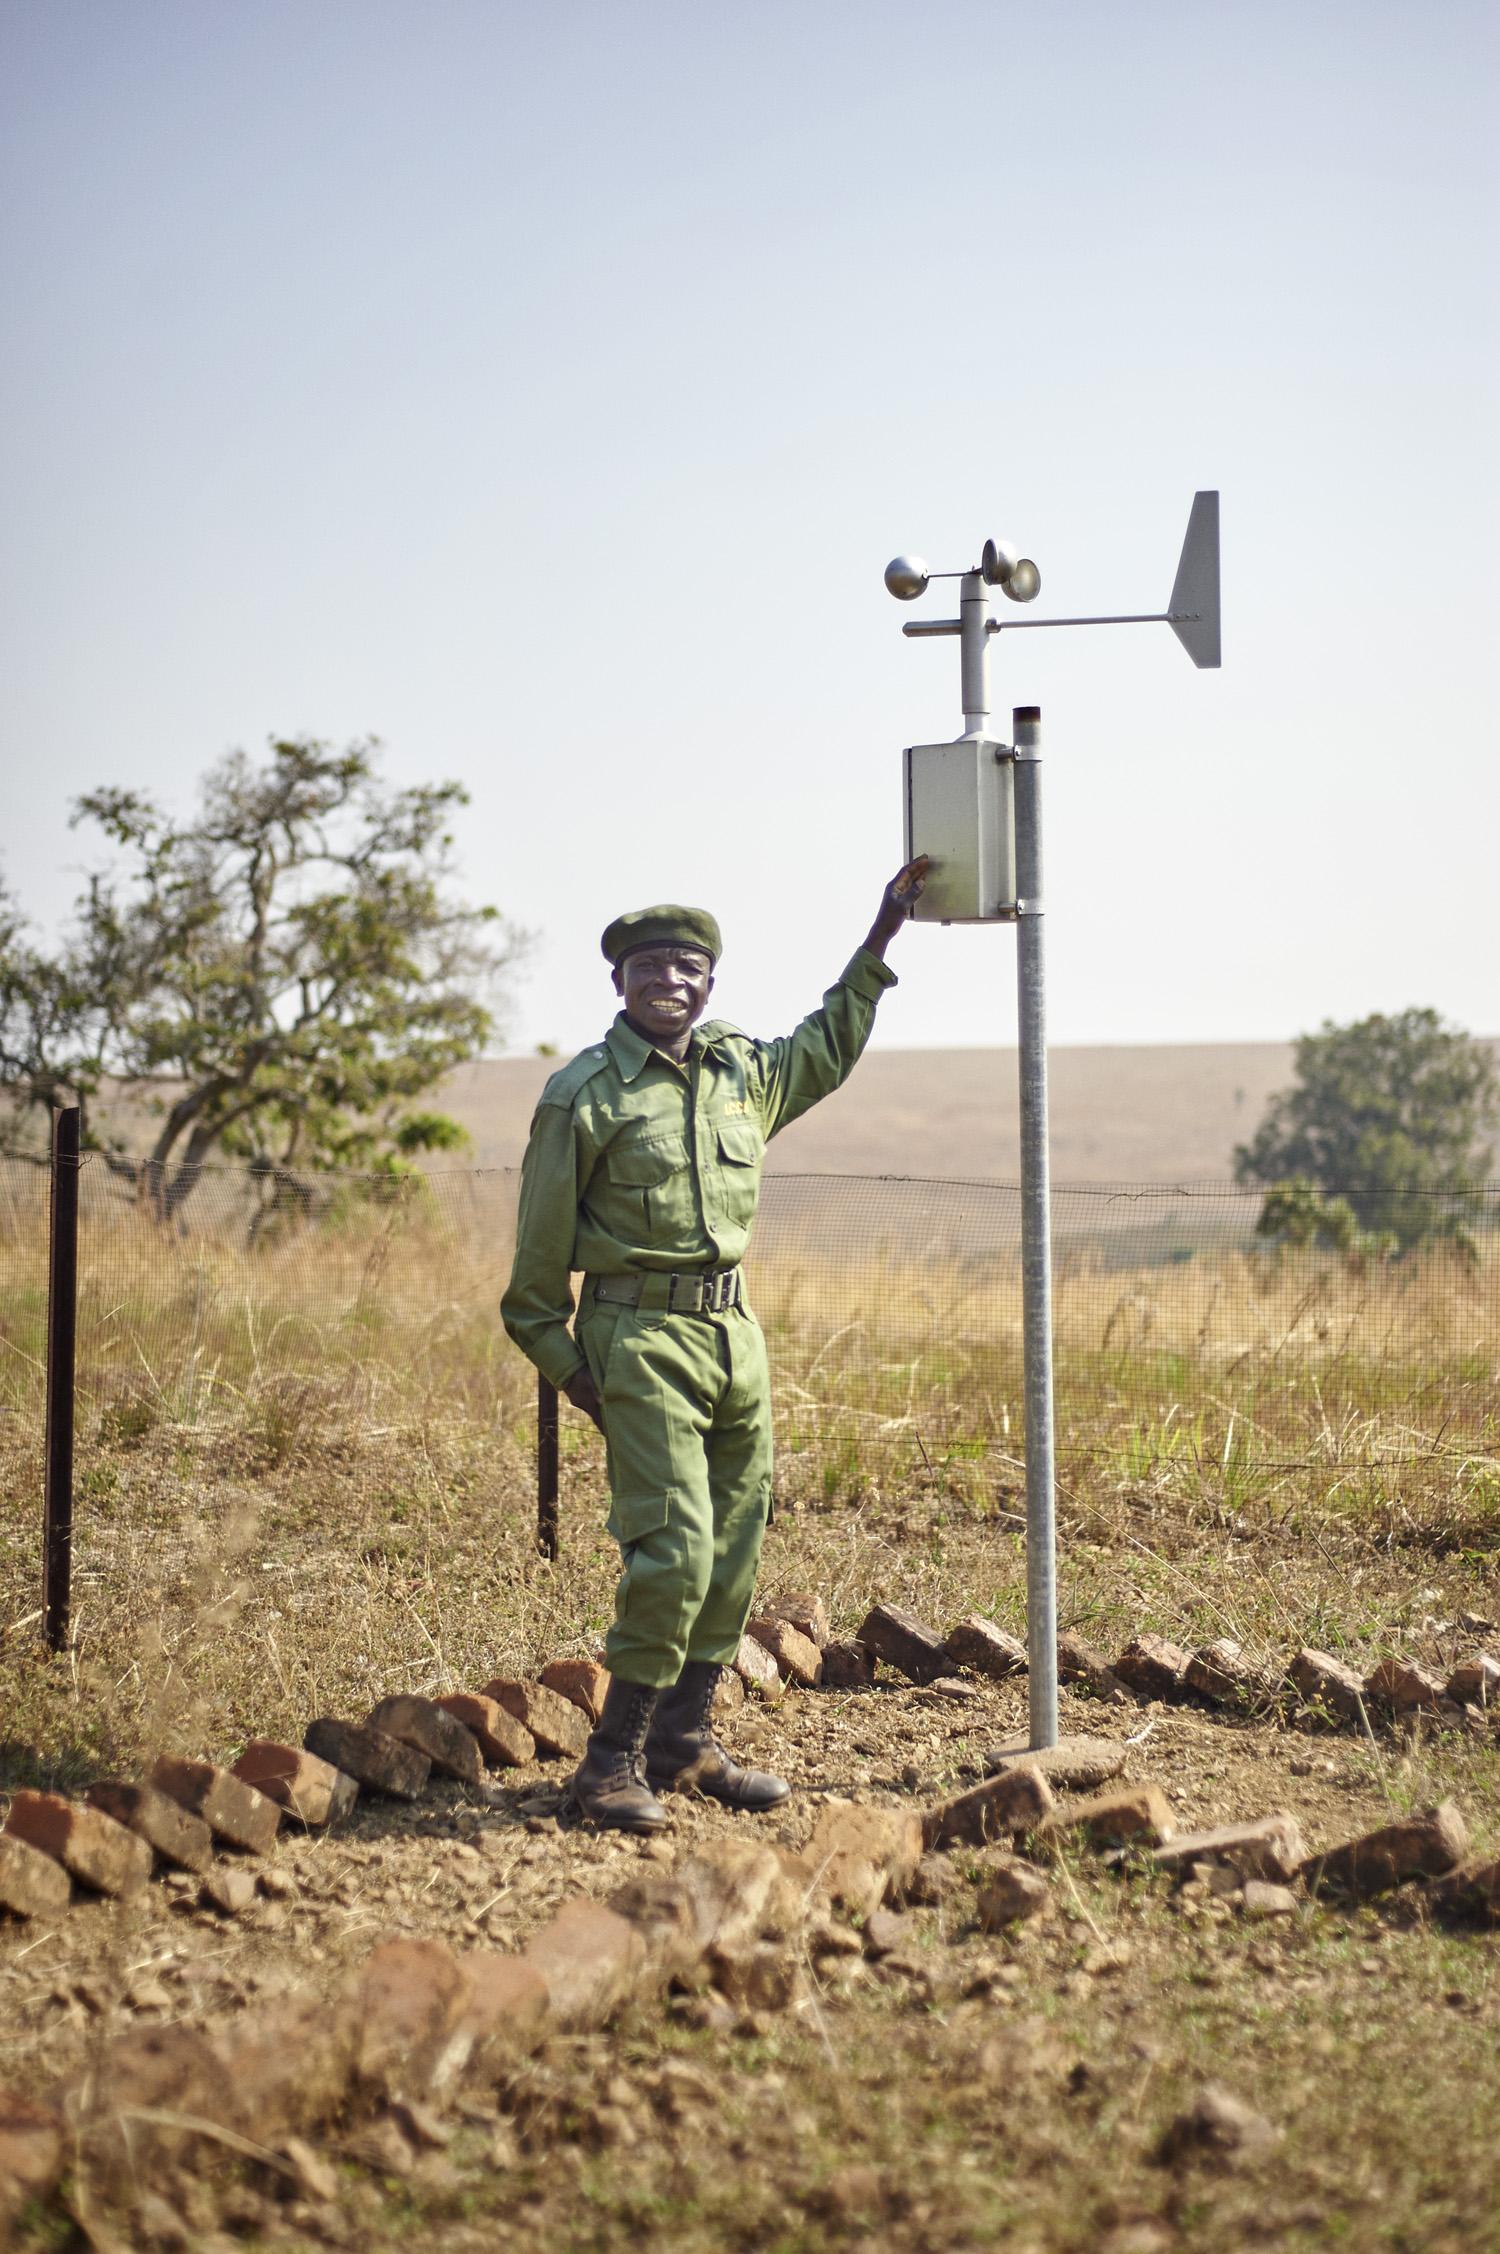 Environmental_sustainability_DR_Congo_Upemba-national-park_20160730_Kongo_Upemba_Park_073.jpg